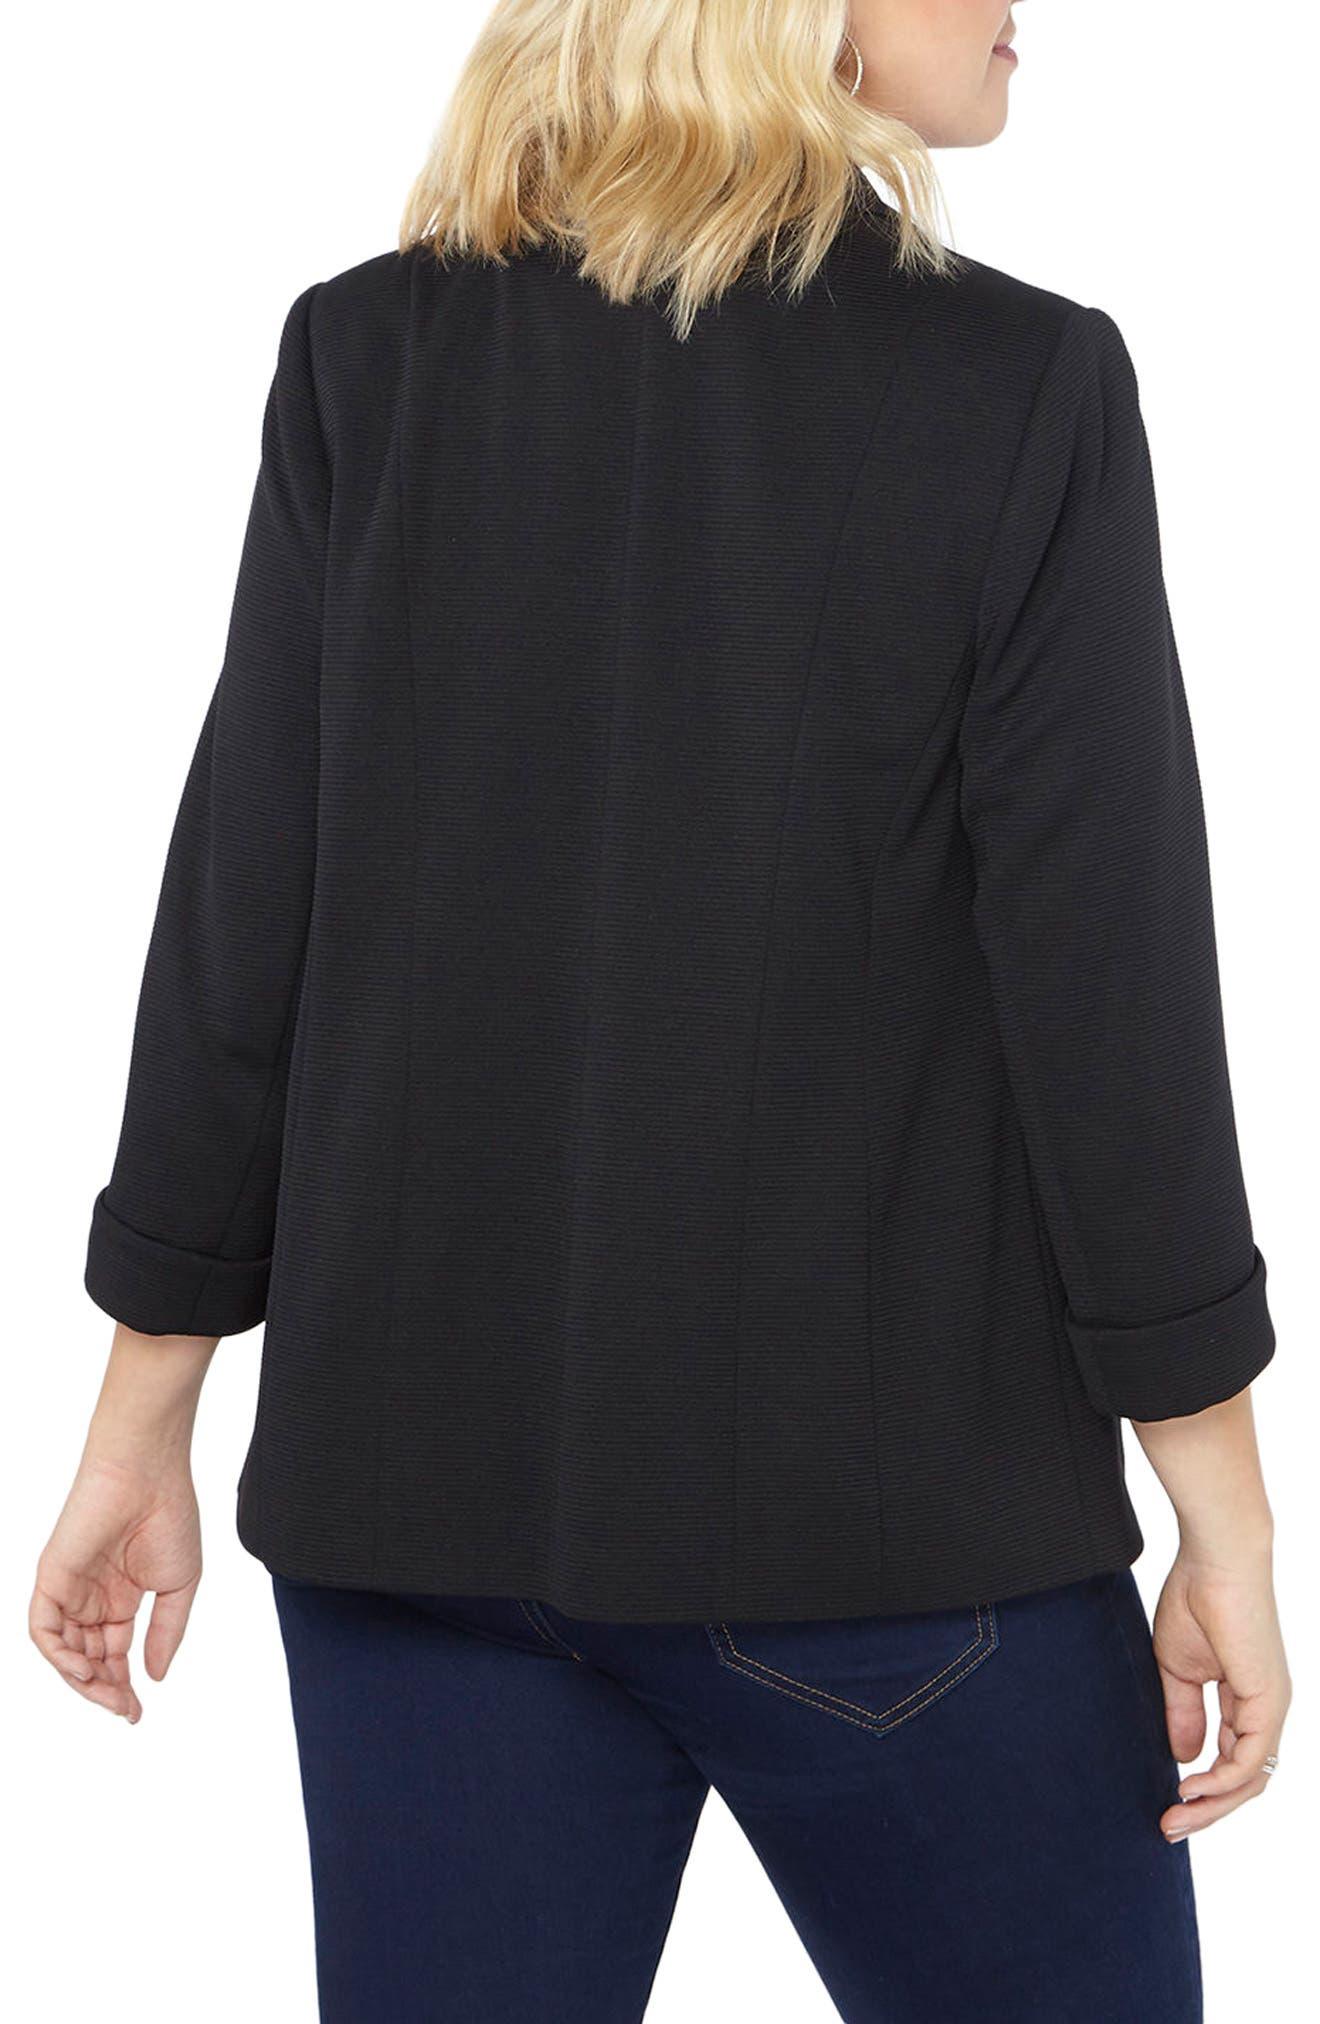 Alternate Image 2  - Evans Ribbed Knit Blazer (Plus Size)